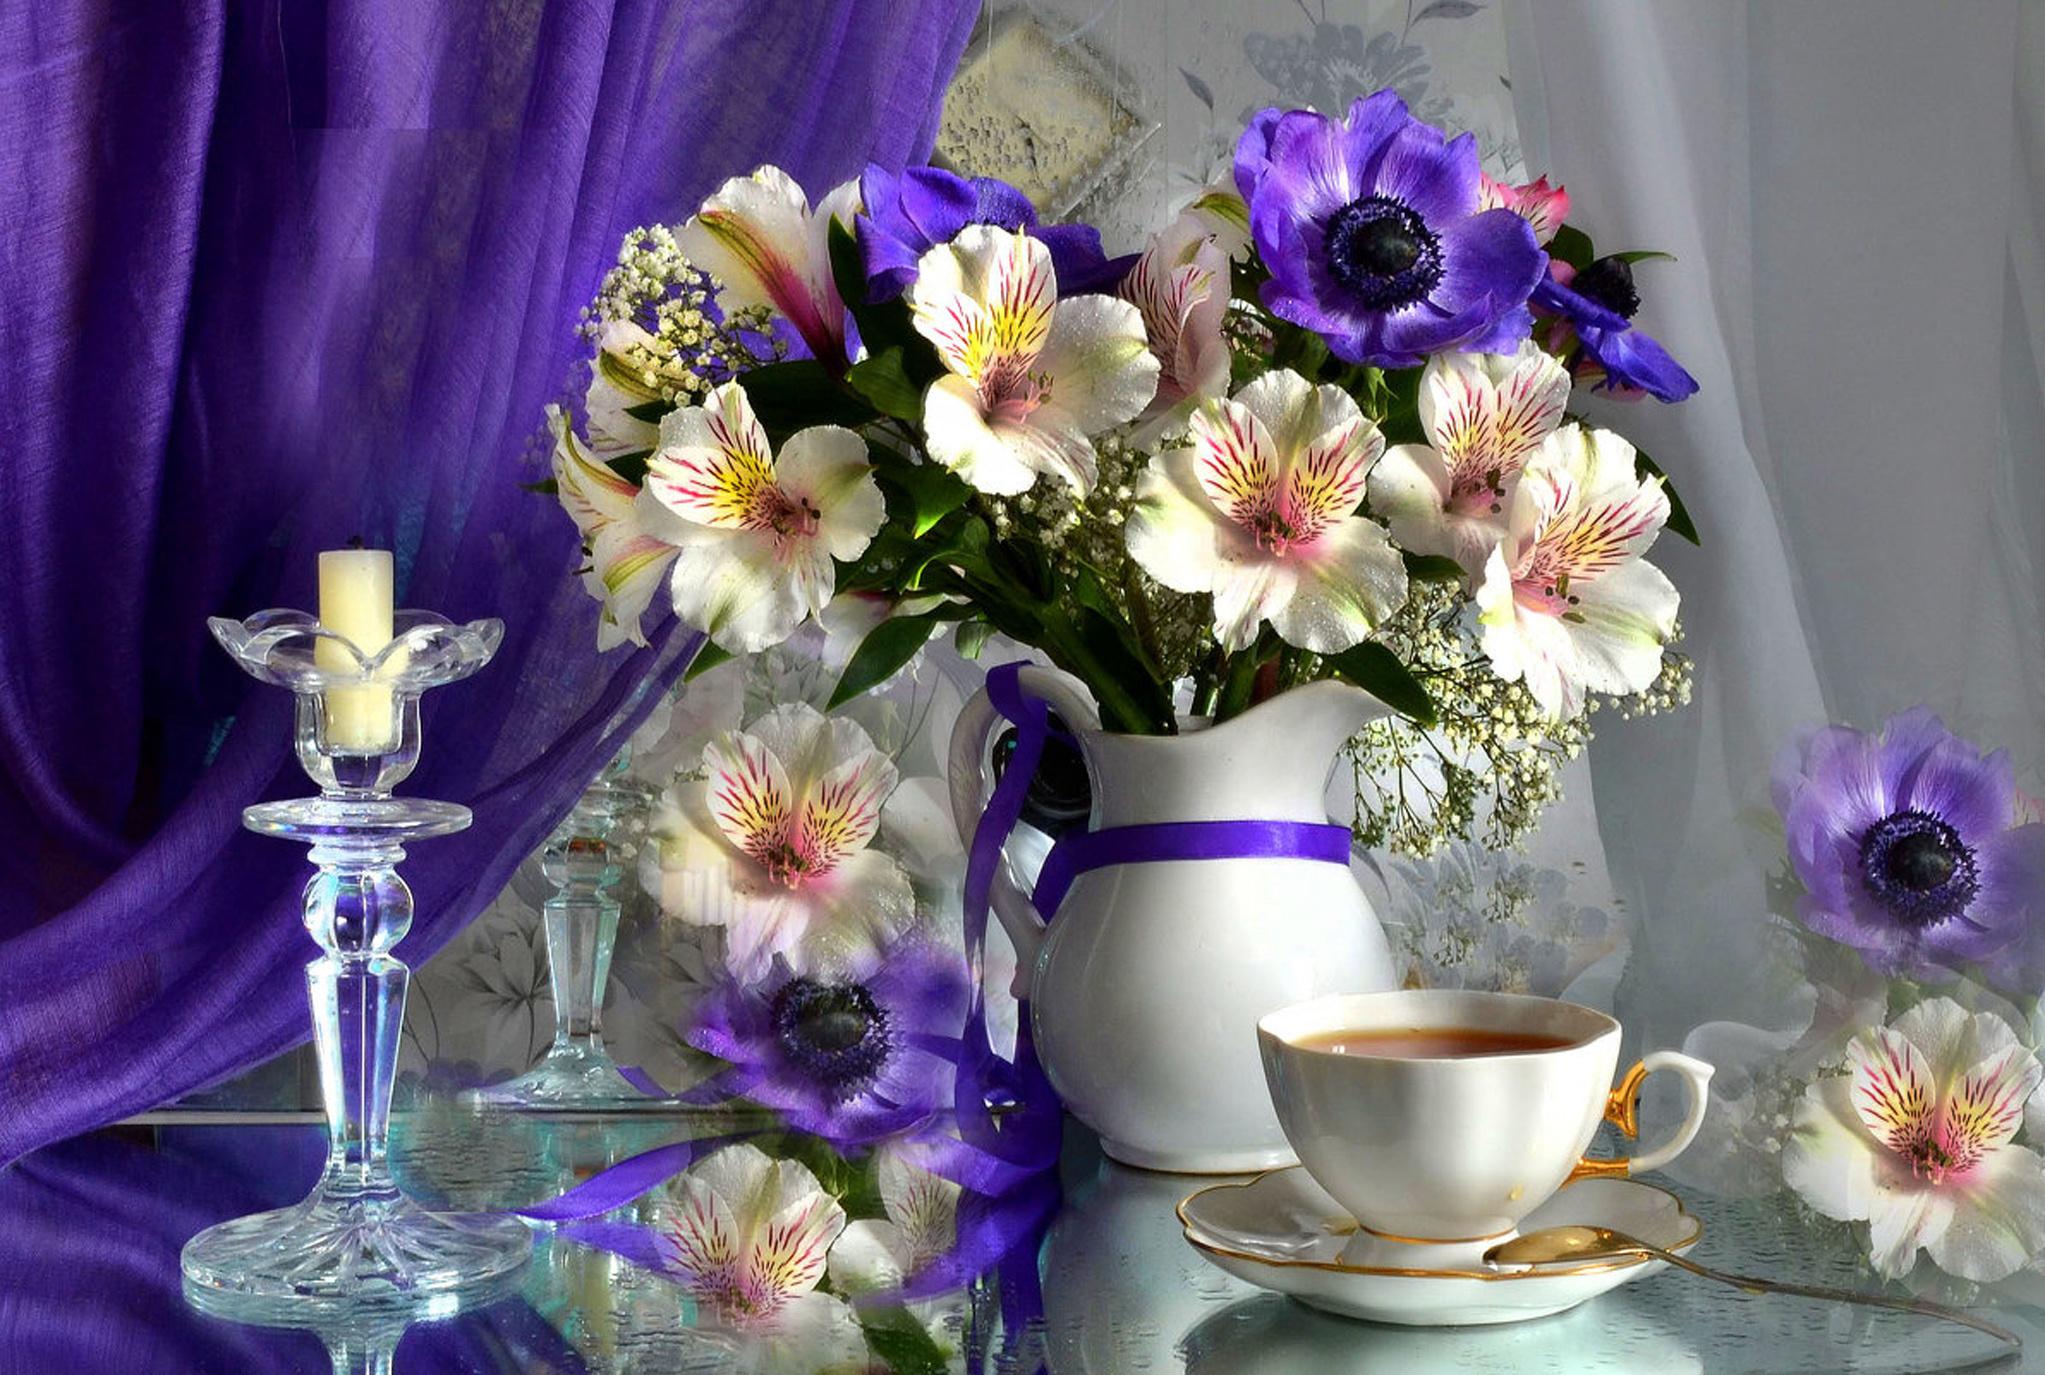 cvety-sveci-bludce-buket-caska-caj-kuvsin-zanaveska-alstromeria-anemony.jpg